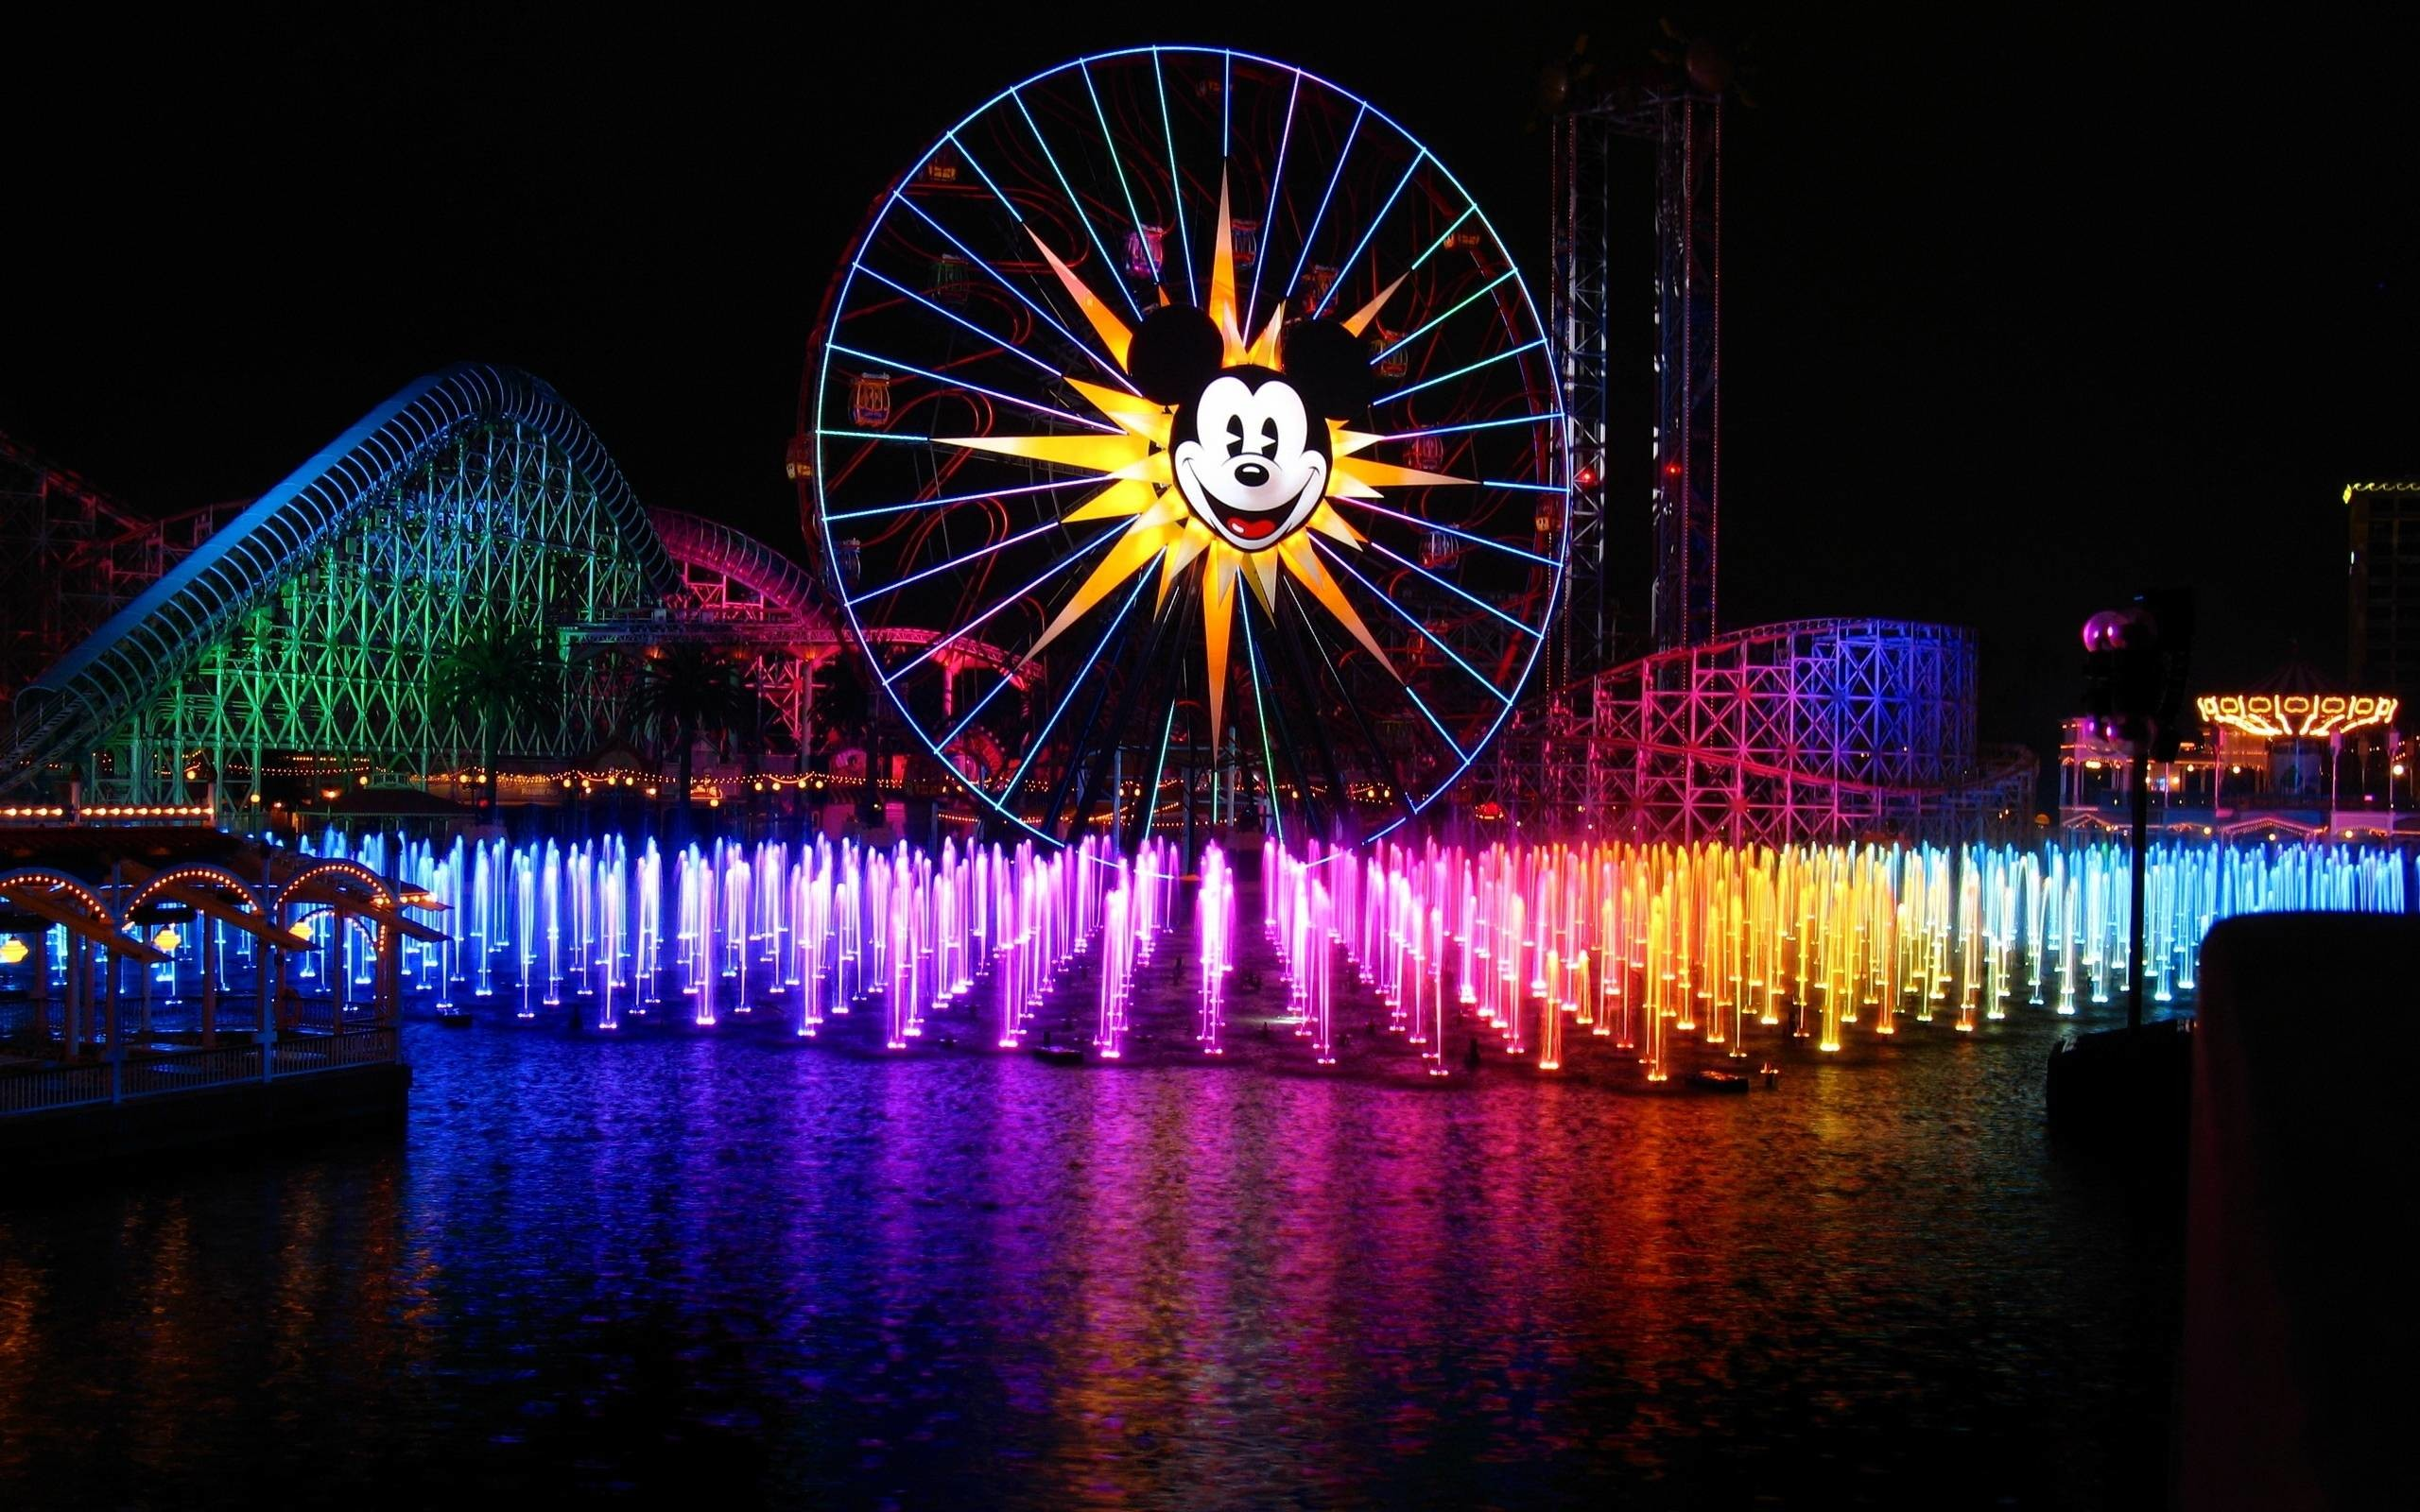 Disneyland Wallpapers – Full HD wallpaper search